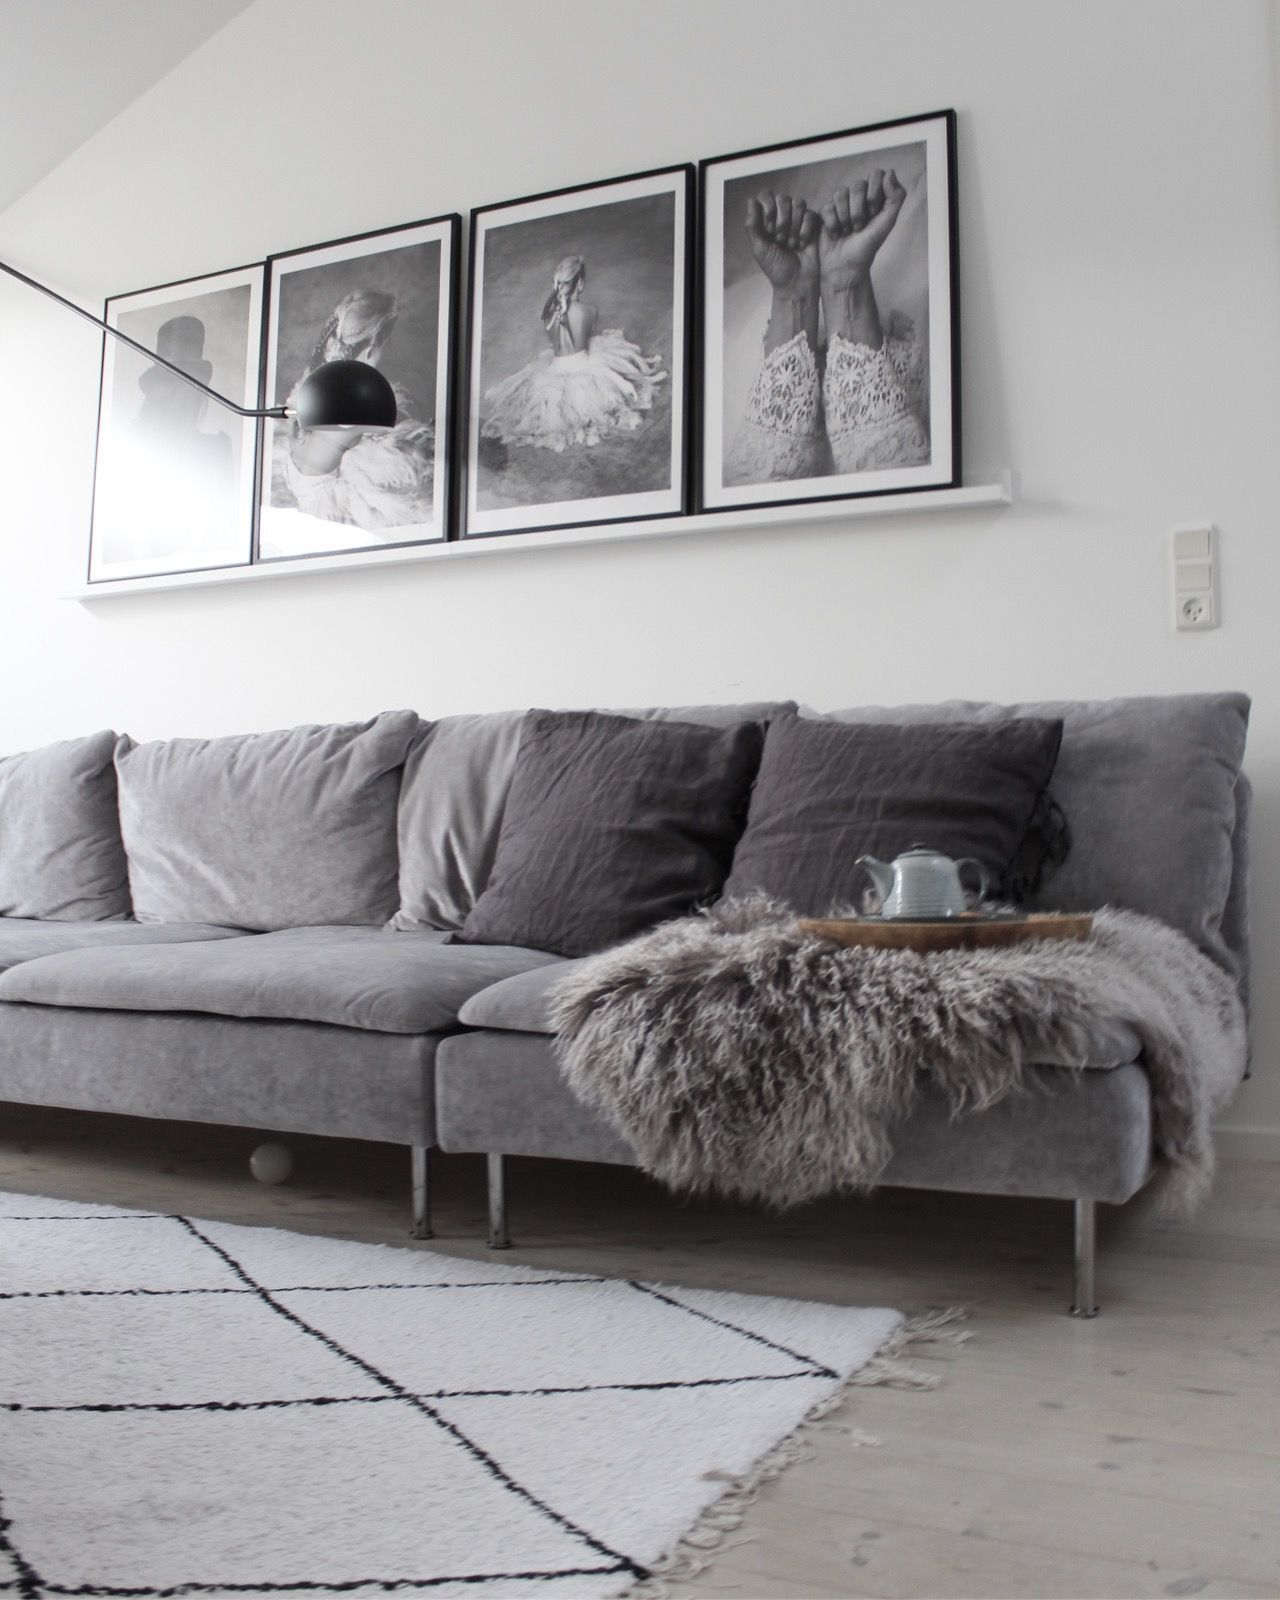 Cool Scandinavian Inspired Living Room With A Grey Velvet Sofa Black And White Photo Art Beni Ou Grey Velvet Sofa Living Room Scandinavian Living Room Sofa